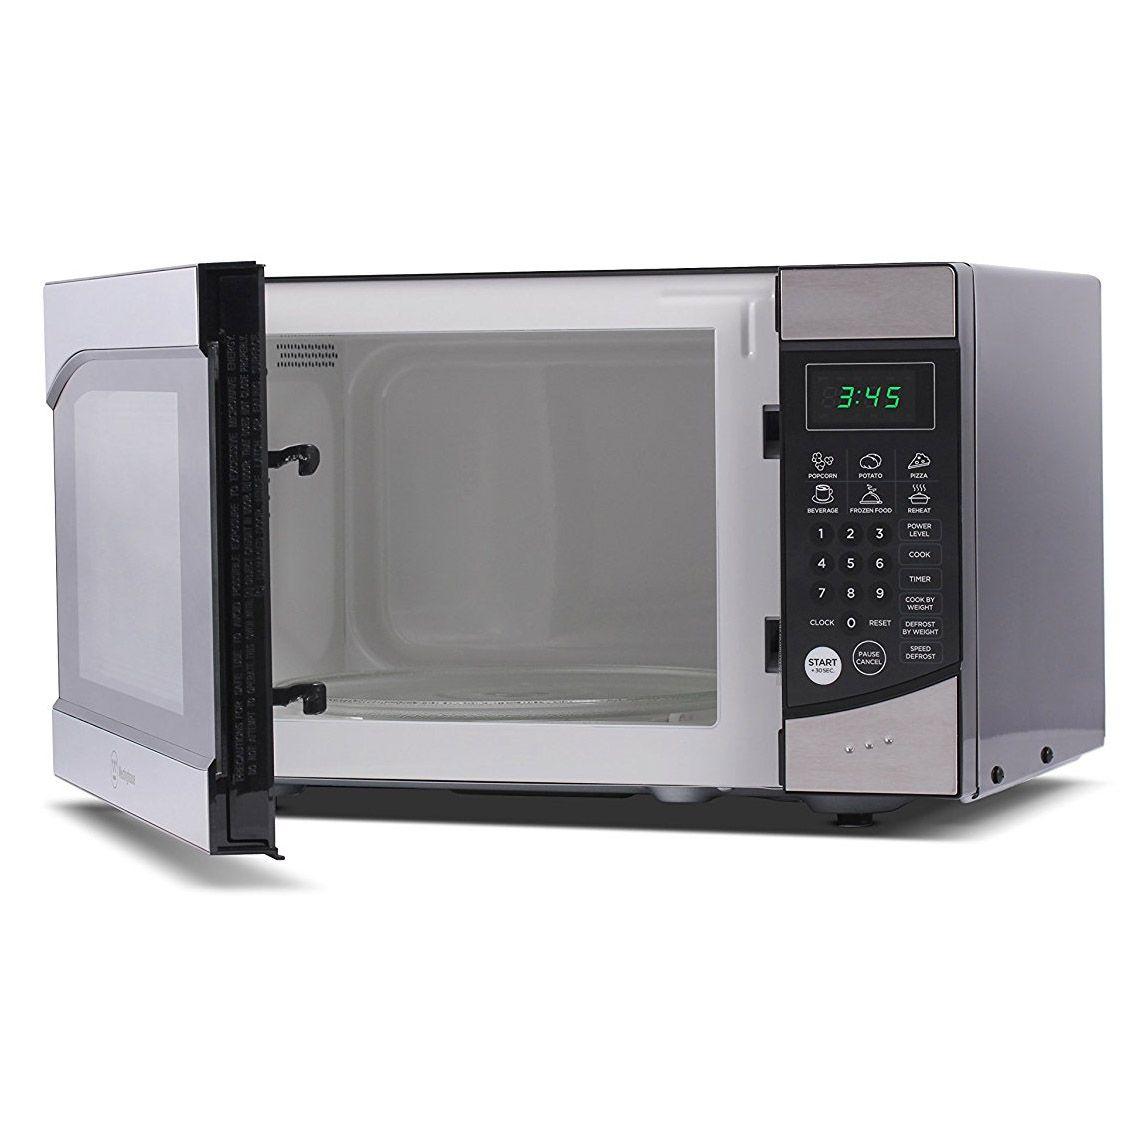 Top 5 Best Ers Countertop Microwave Ovens Bester Besting